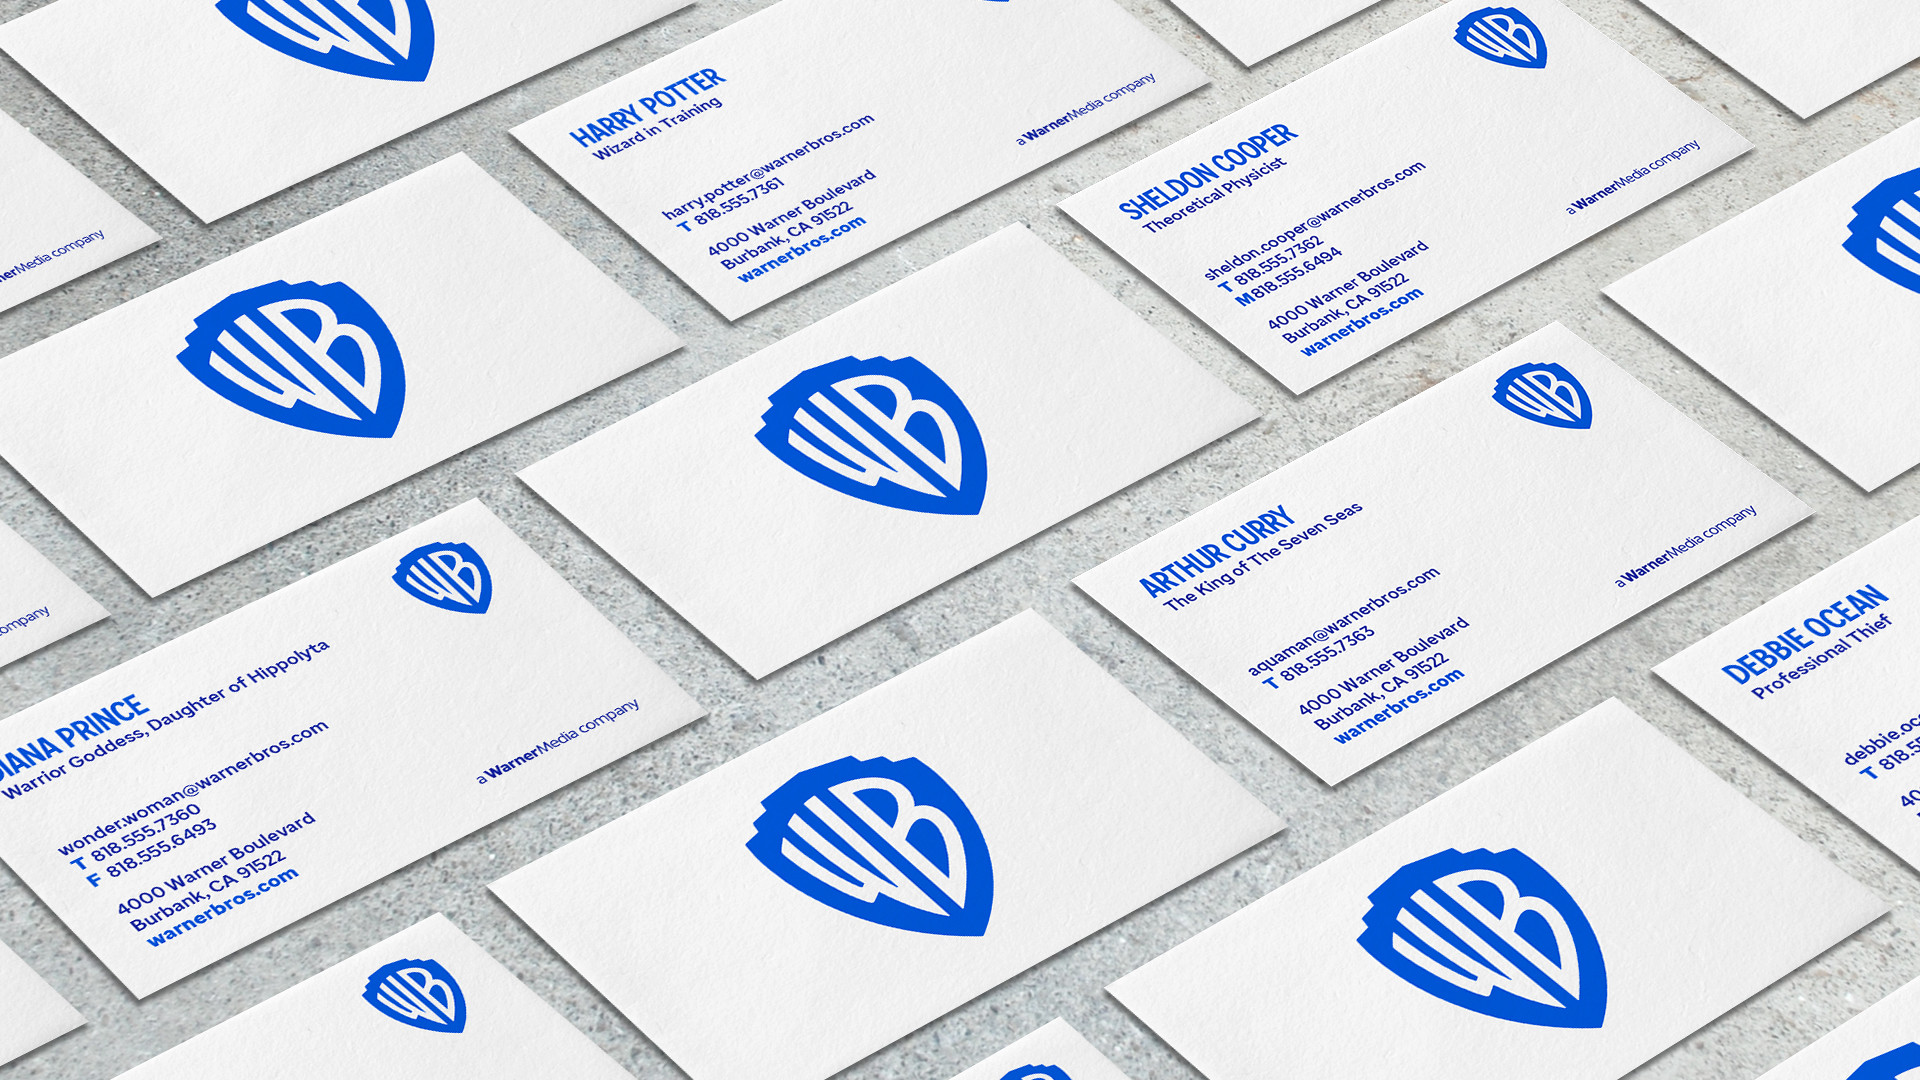 WB_Stationery_Cards_111219.jpg